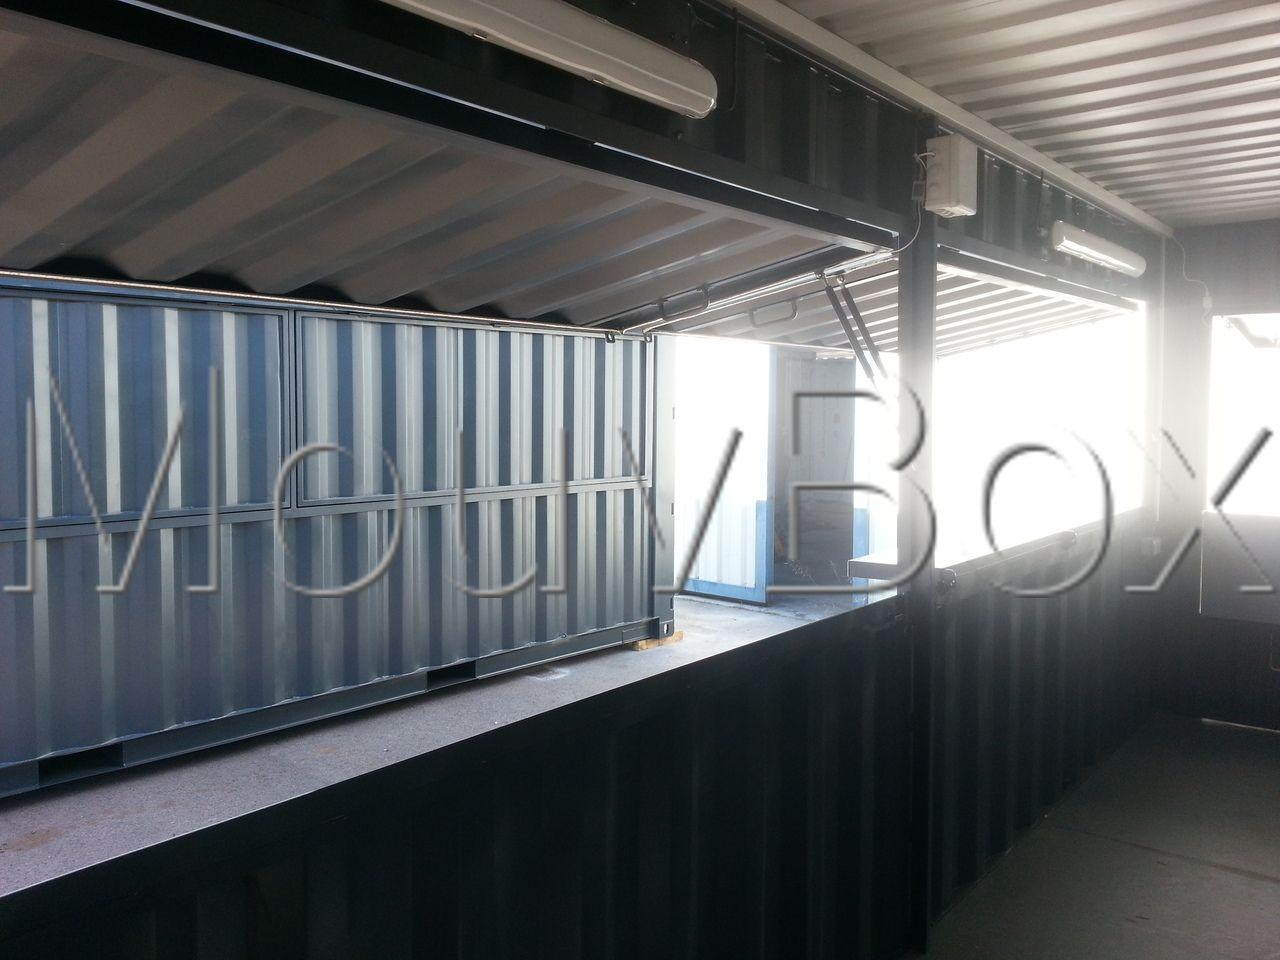 snack-box-container-conteneur-box-caisson-20ft-transformation-neuf-vente-location-mouvbox